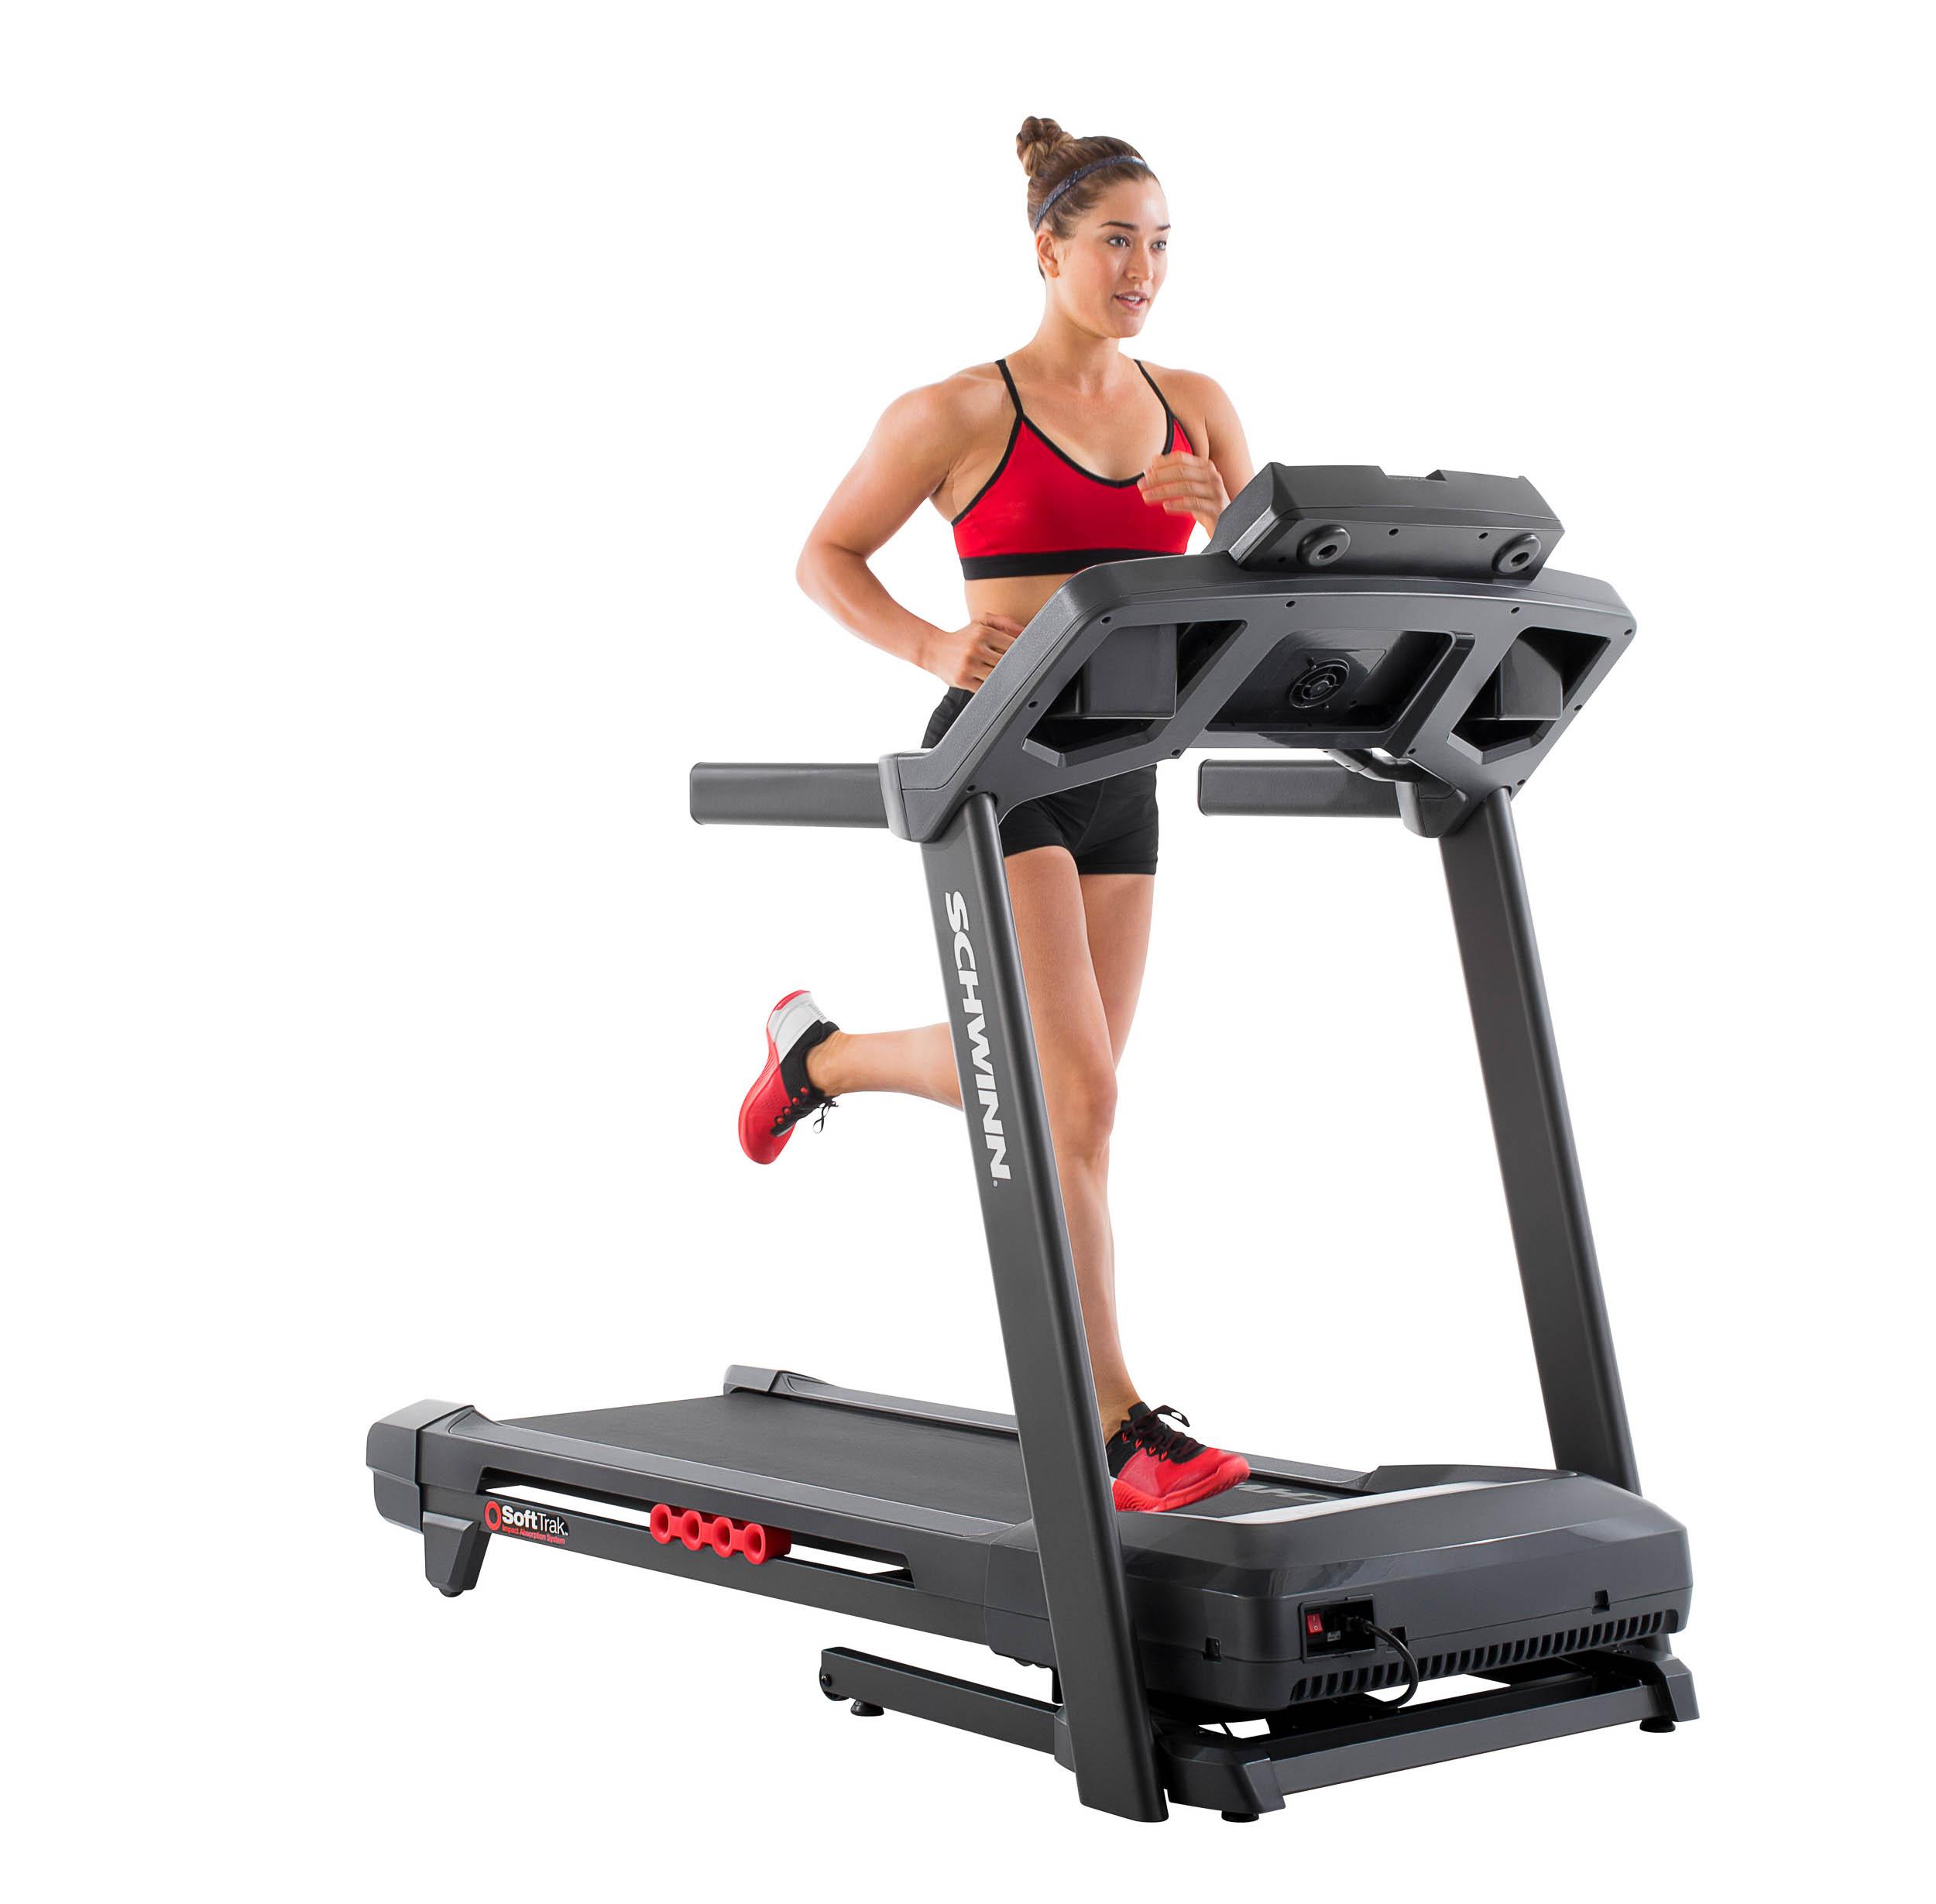 Nautilus_Direct_116099_Schwinn Treadmill 830 Studio Front 3-4 Julie_134 copy.jpg